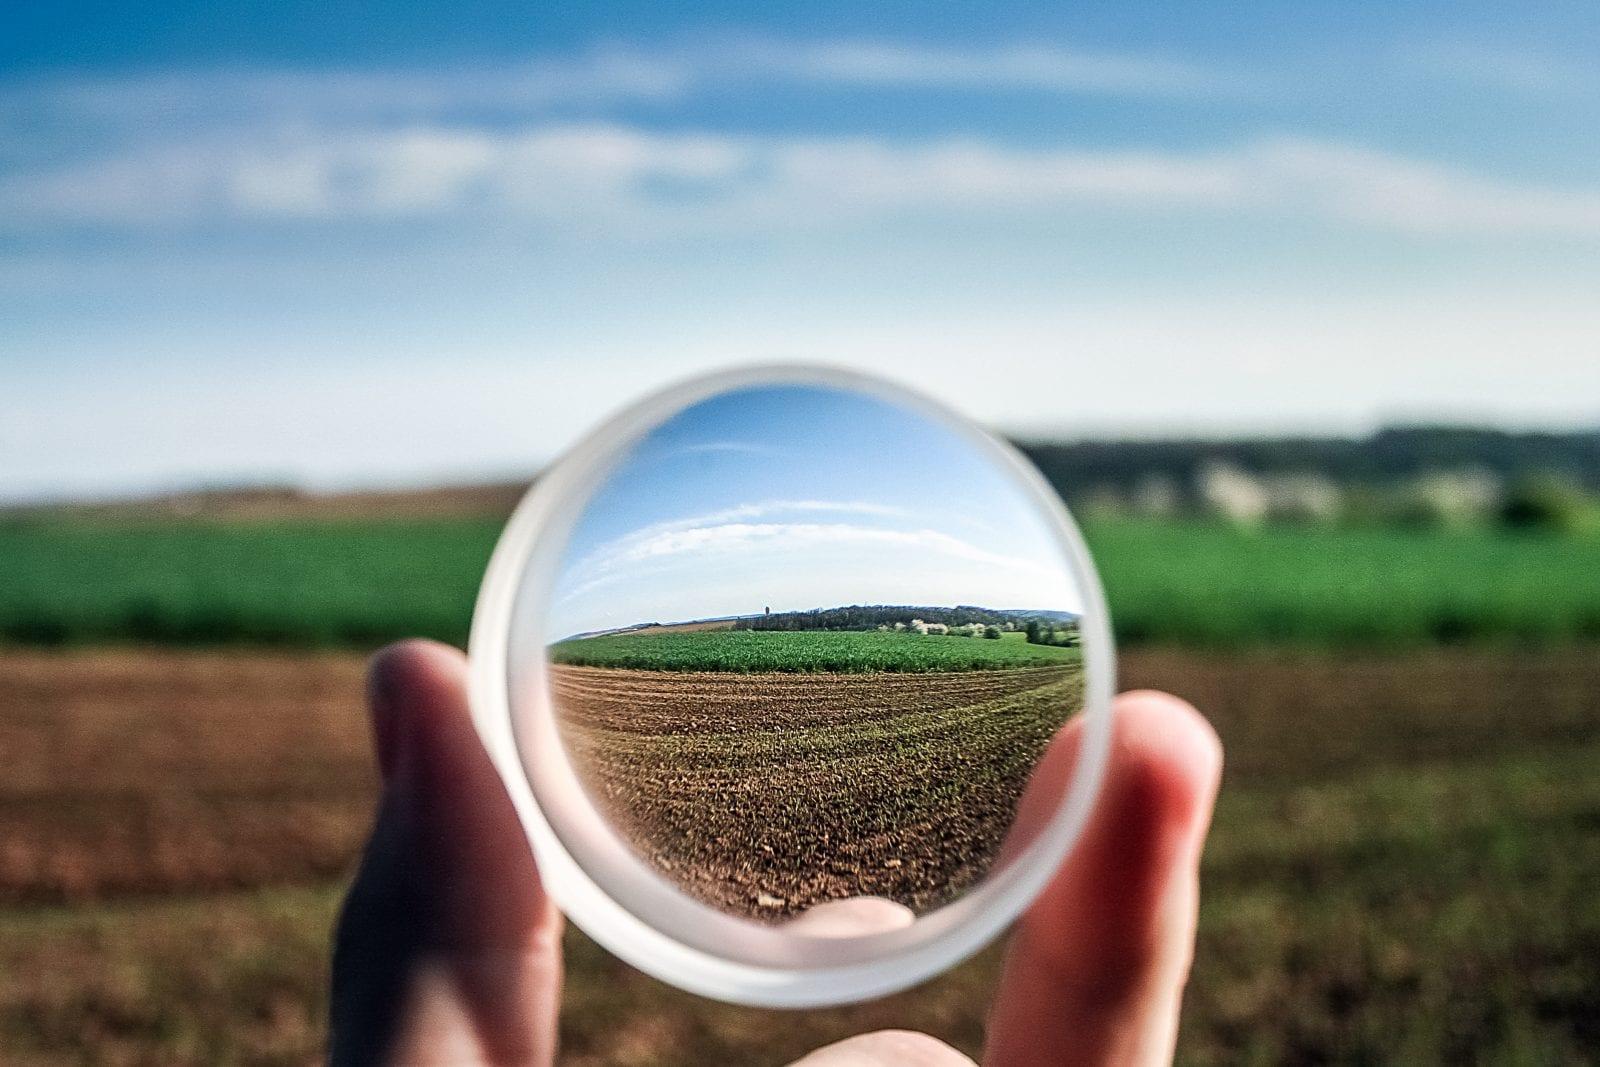 magnifying glass, lens